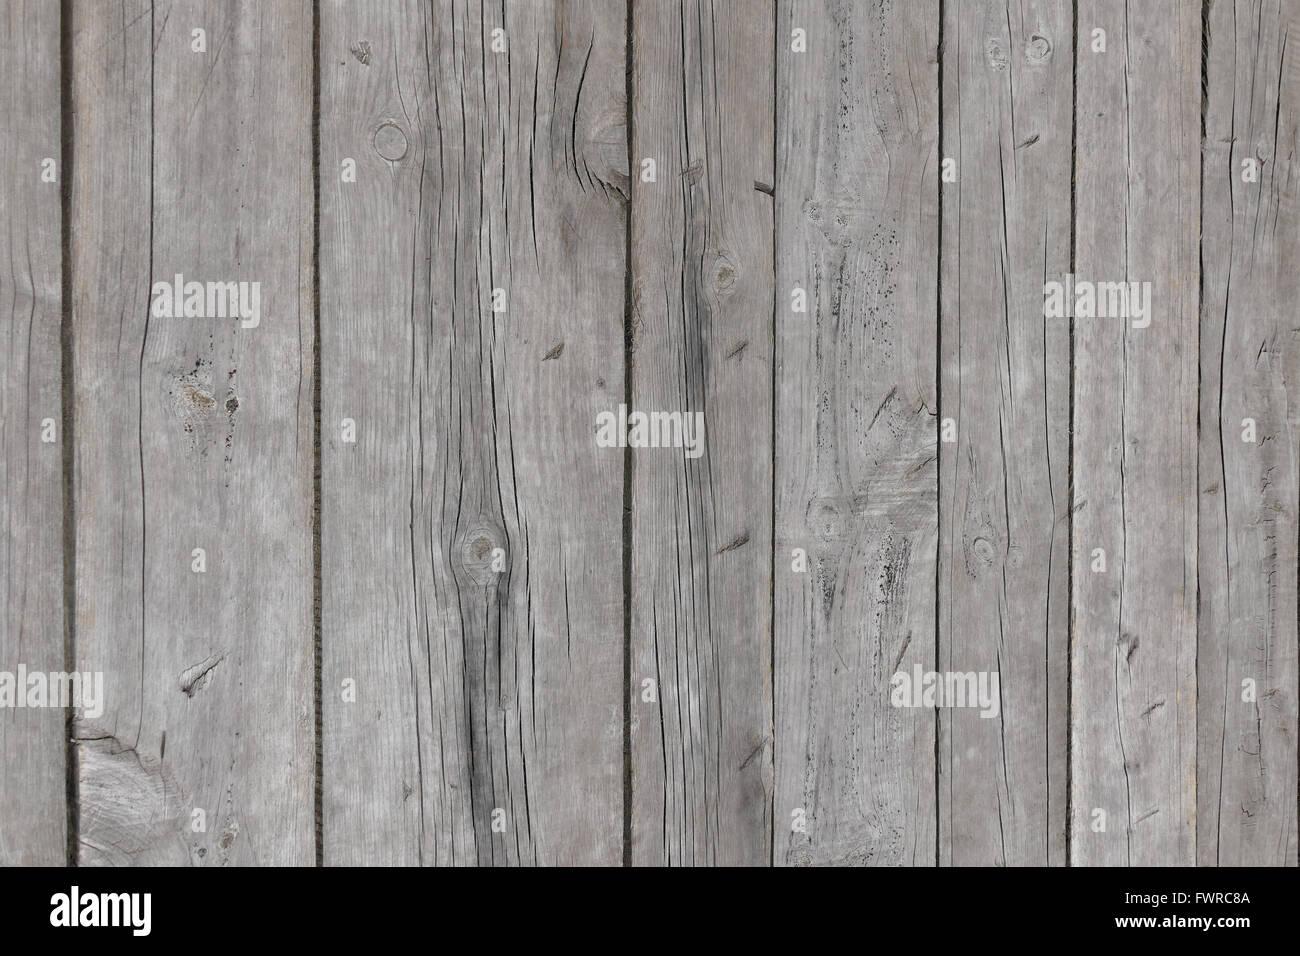 eine wand aus kiefer-dielen stockfoto, bild: 101932778 - alamy